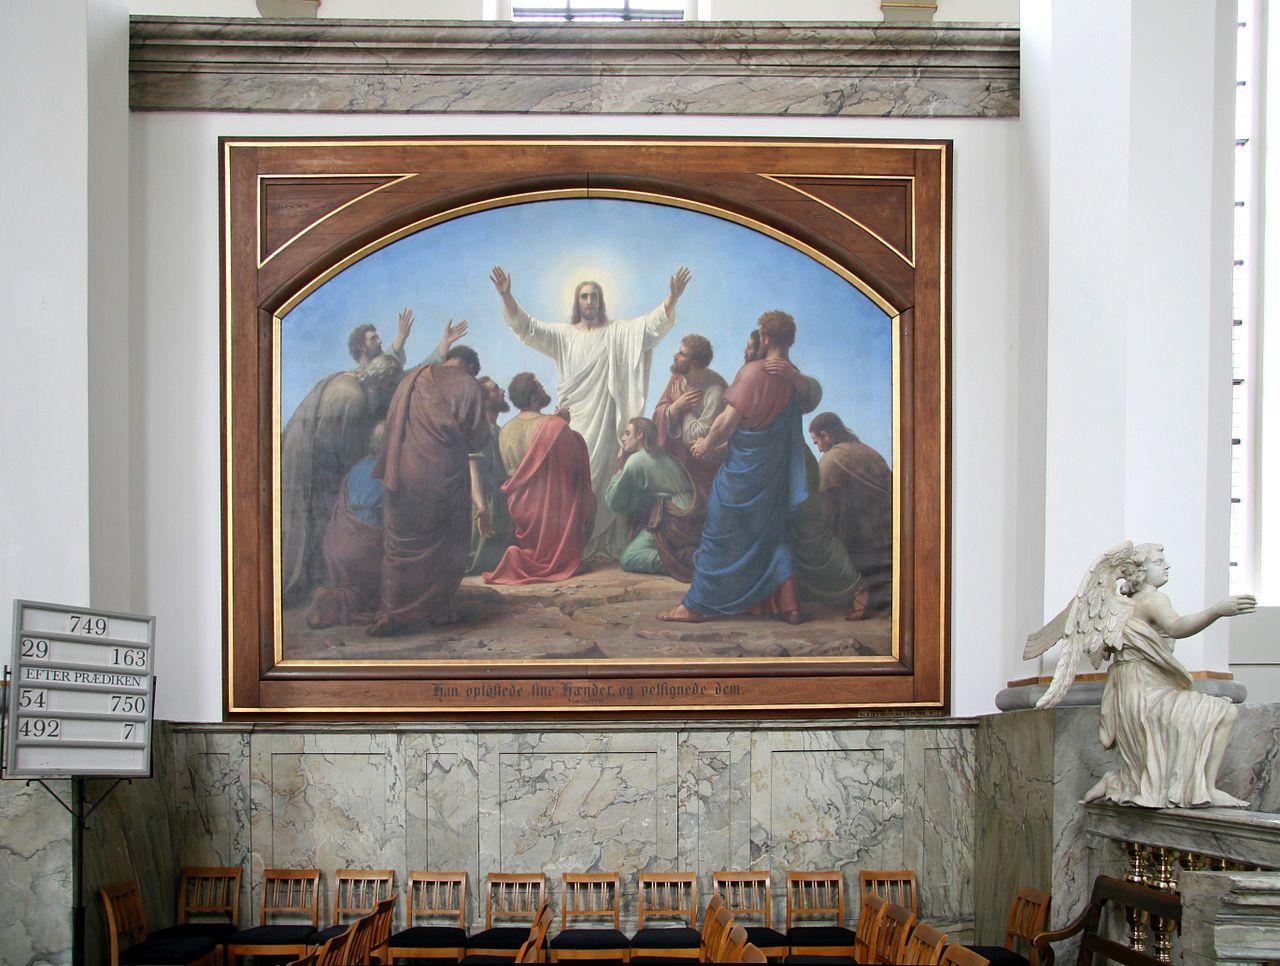 Trinitatis Kirke Copenhagen Painting1 Trinitatis Kirke Kobenhavn Wikipedia Den Frie Encyklopaedi